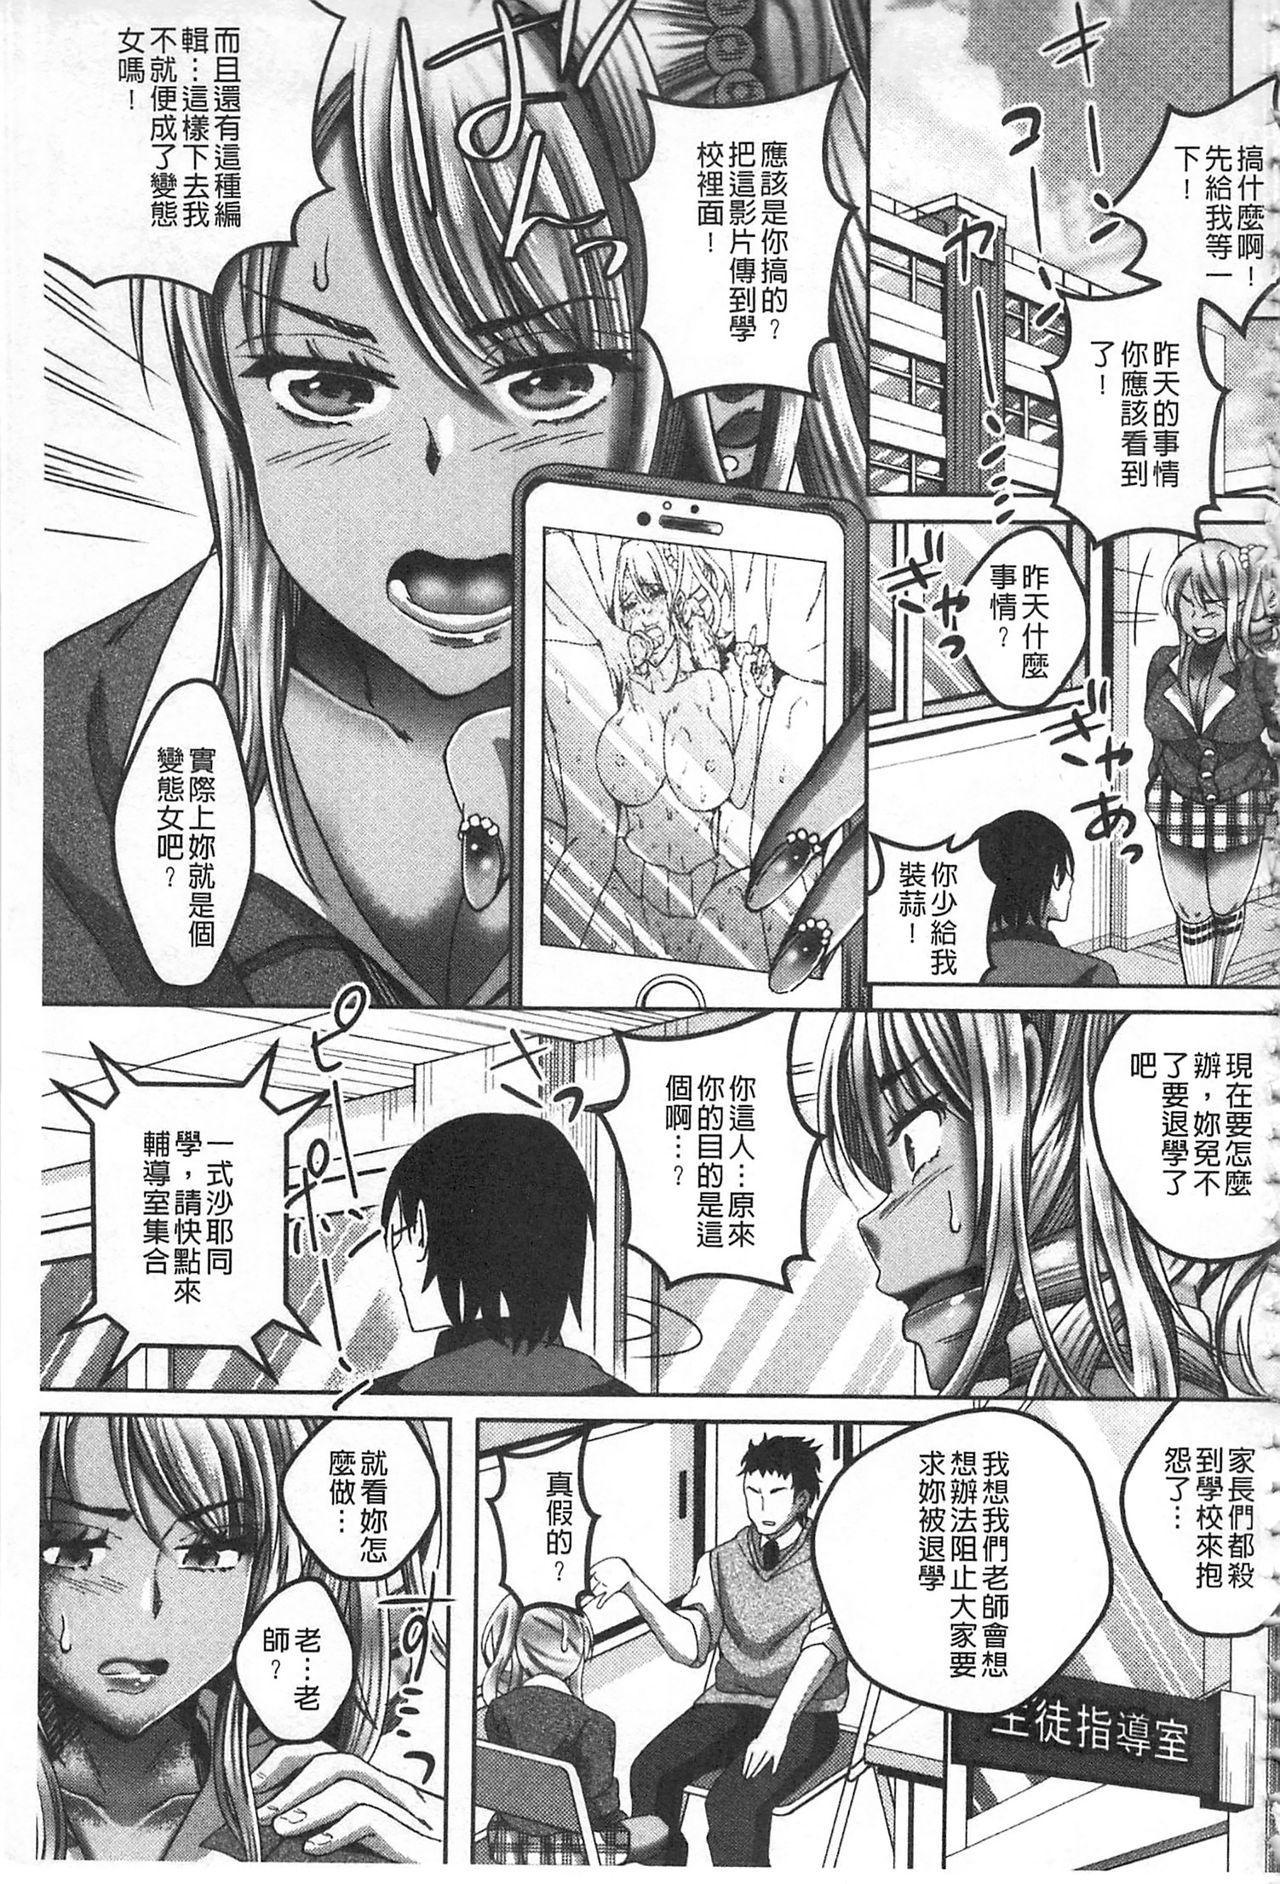 Kanjuku Otome no Odoshikata | 姦熟乙女的脅迫法 98